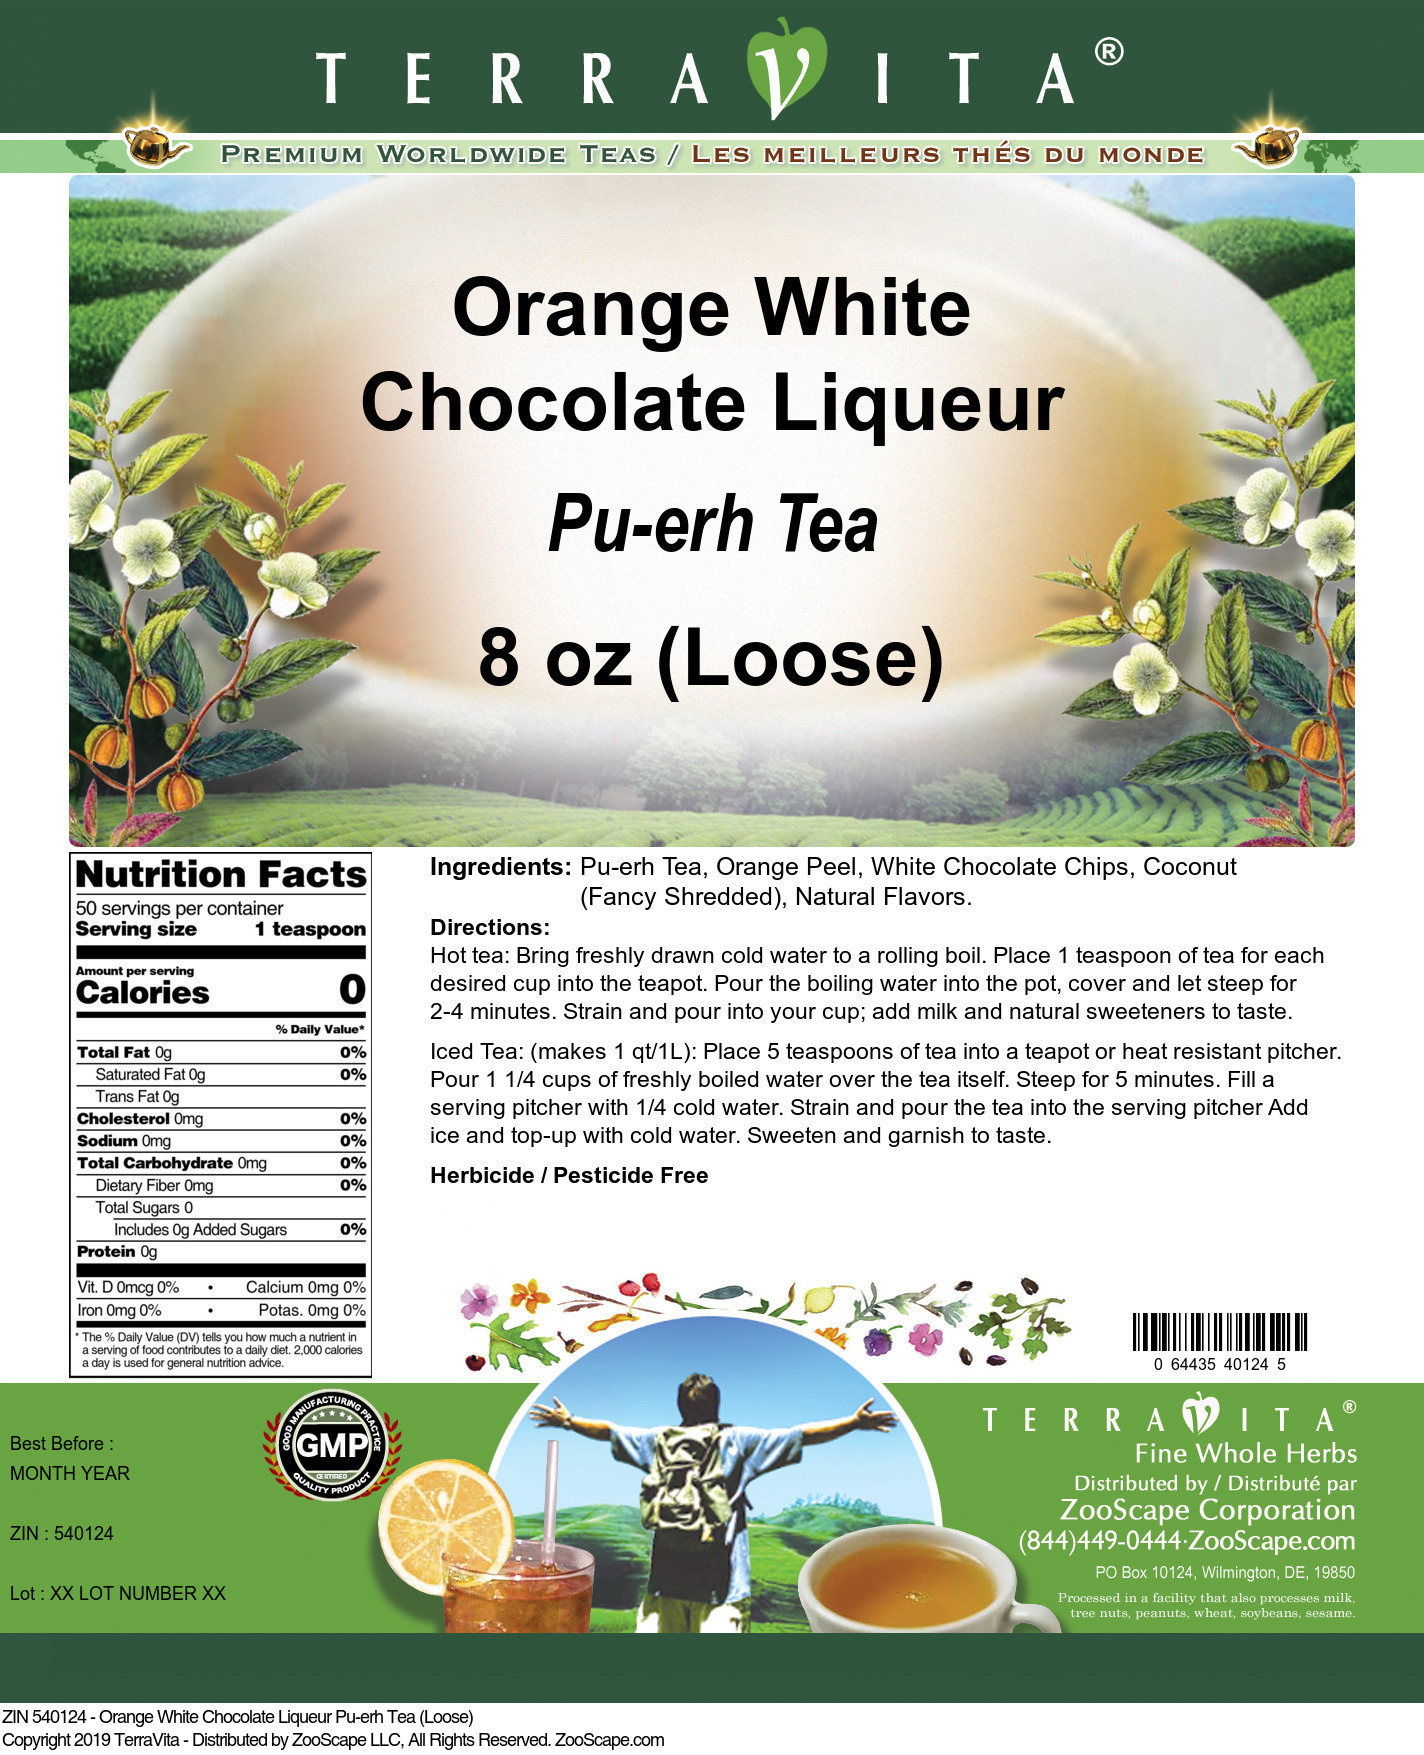 Orange White Chocolate Liqueur Pu-erh Tea (Loose)